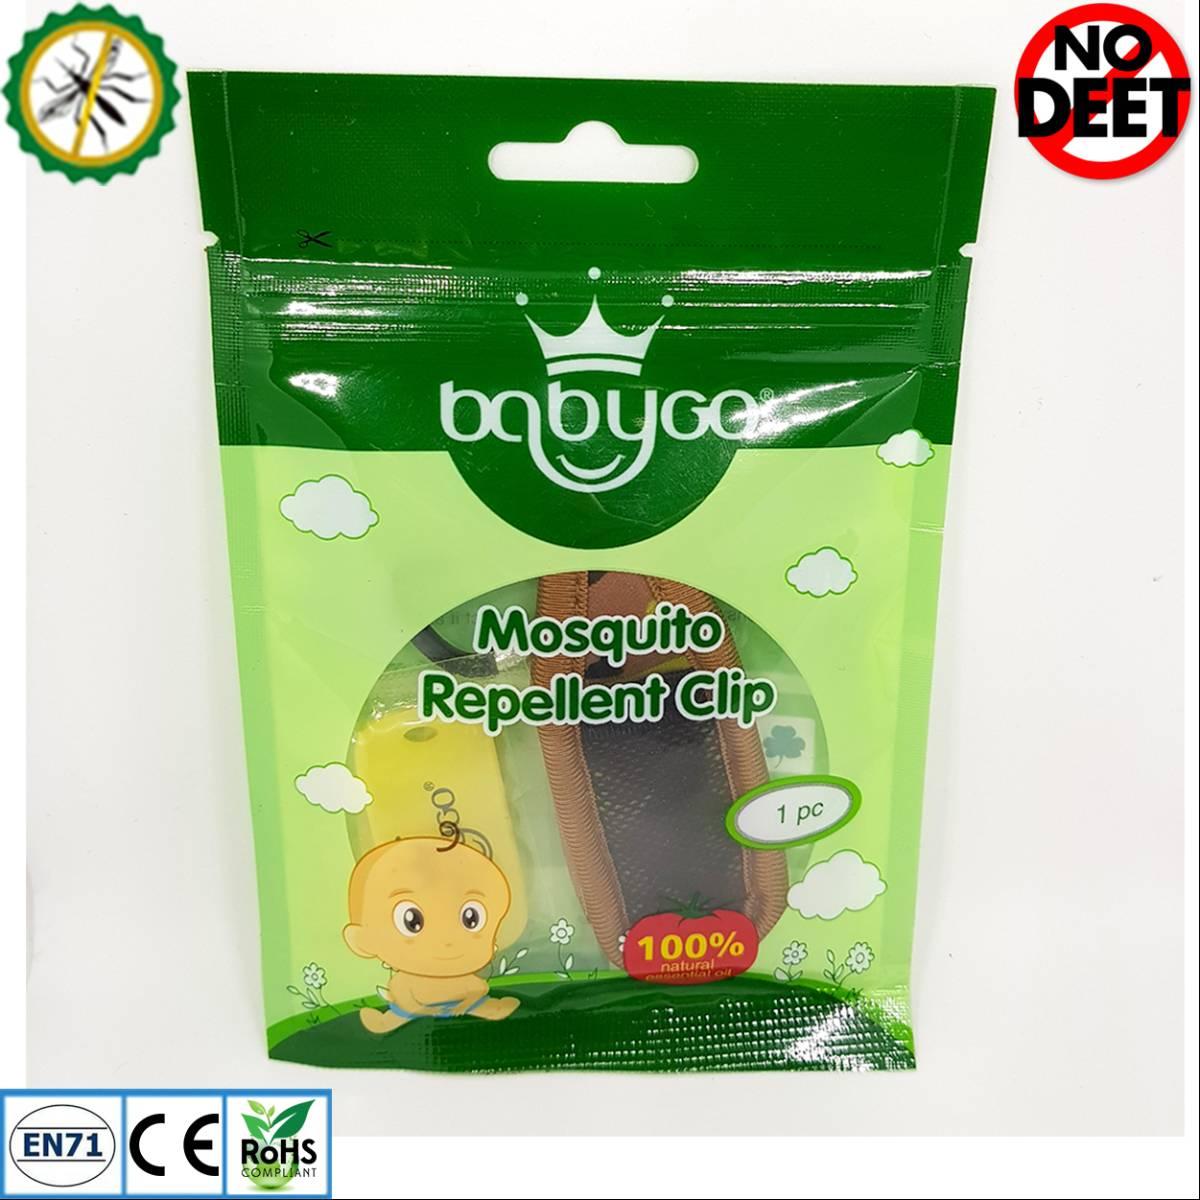 Babygo Neoprene Clip Mosquito Repellent Camouflage (klip Anti Nyamuk) Army1